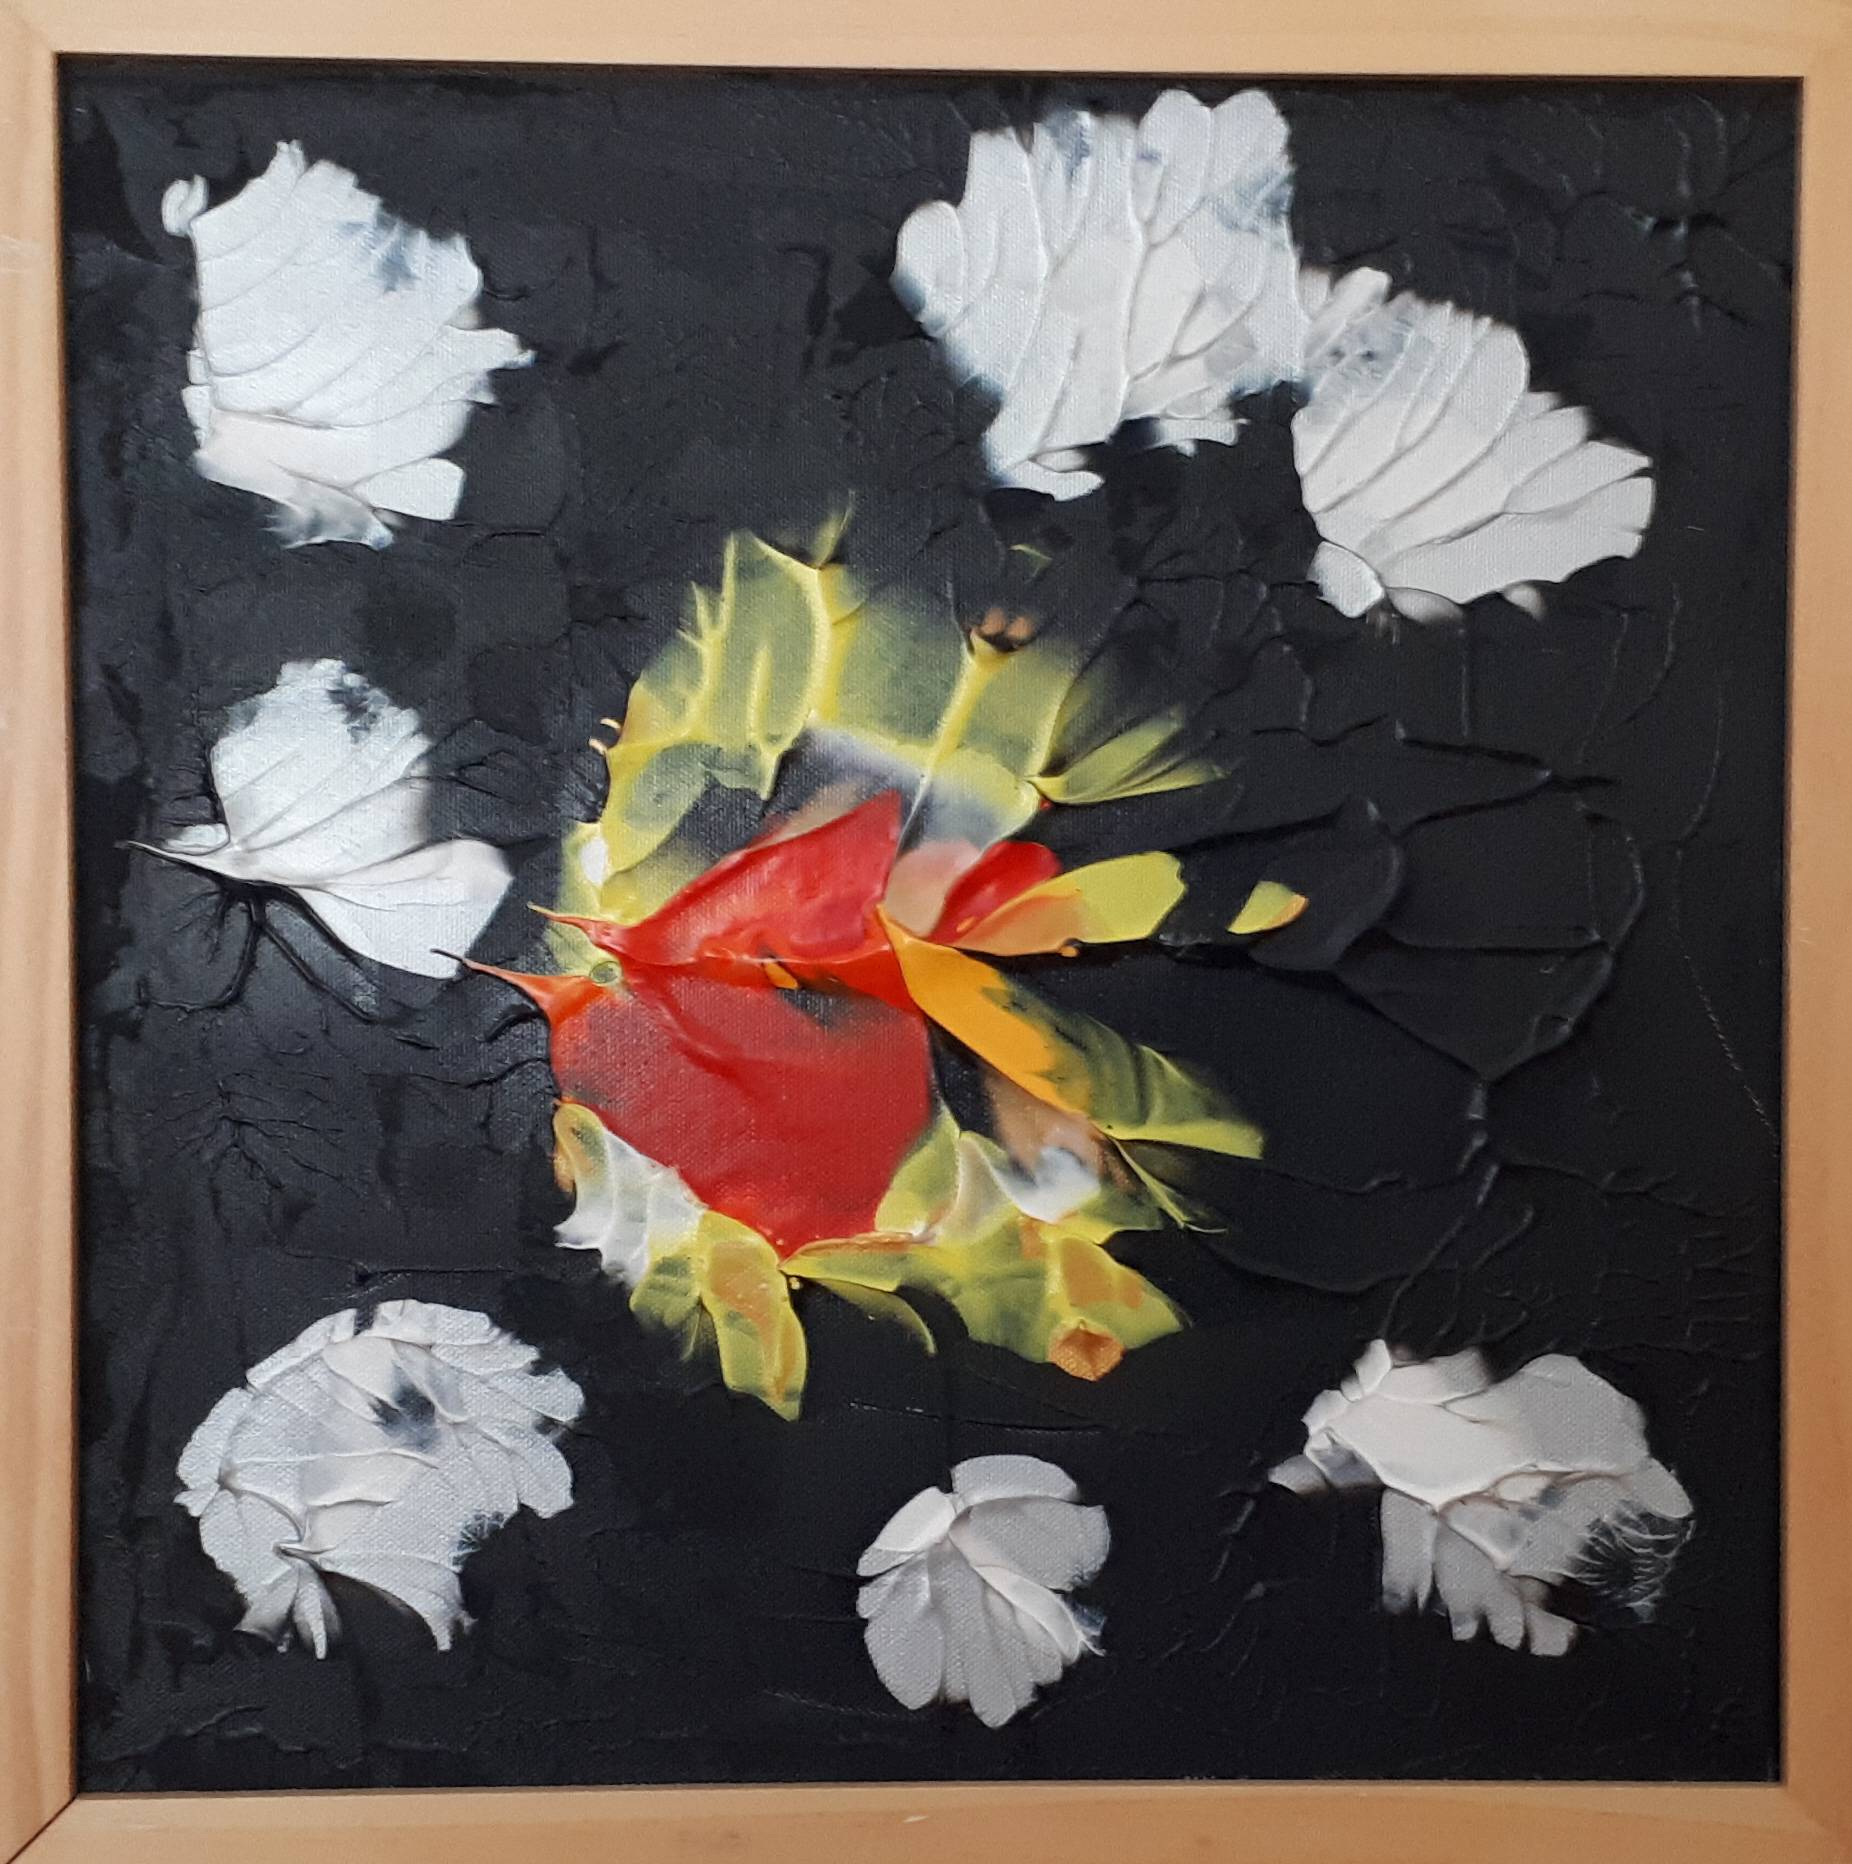 Piranha - Hans-Joachim Netzbandt